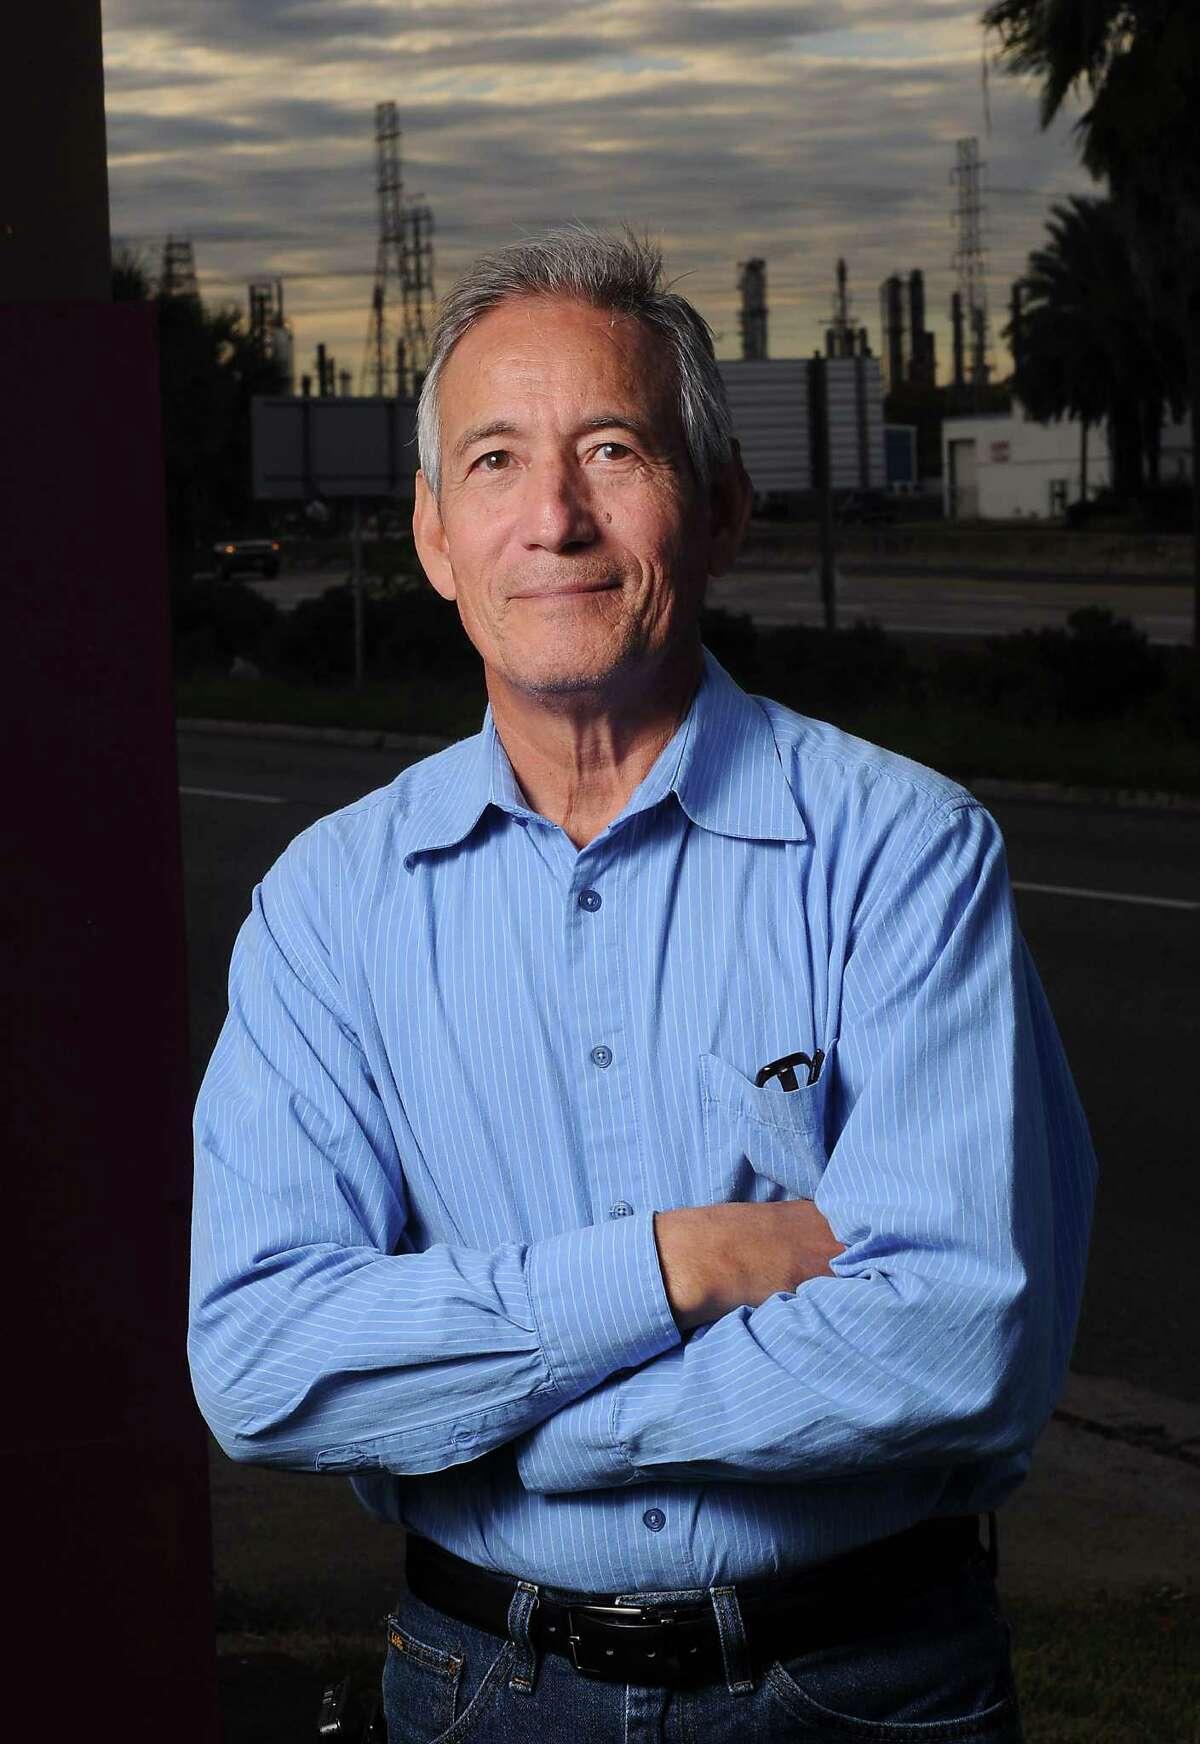 Newly elected GOP state rep Gilbert Pena in Pasadena Monday Nov. 24, 2014.(Dave Rossman photo)